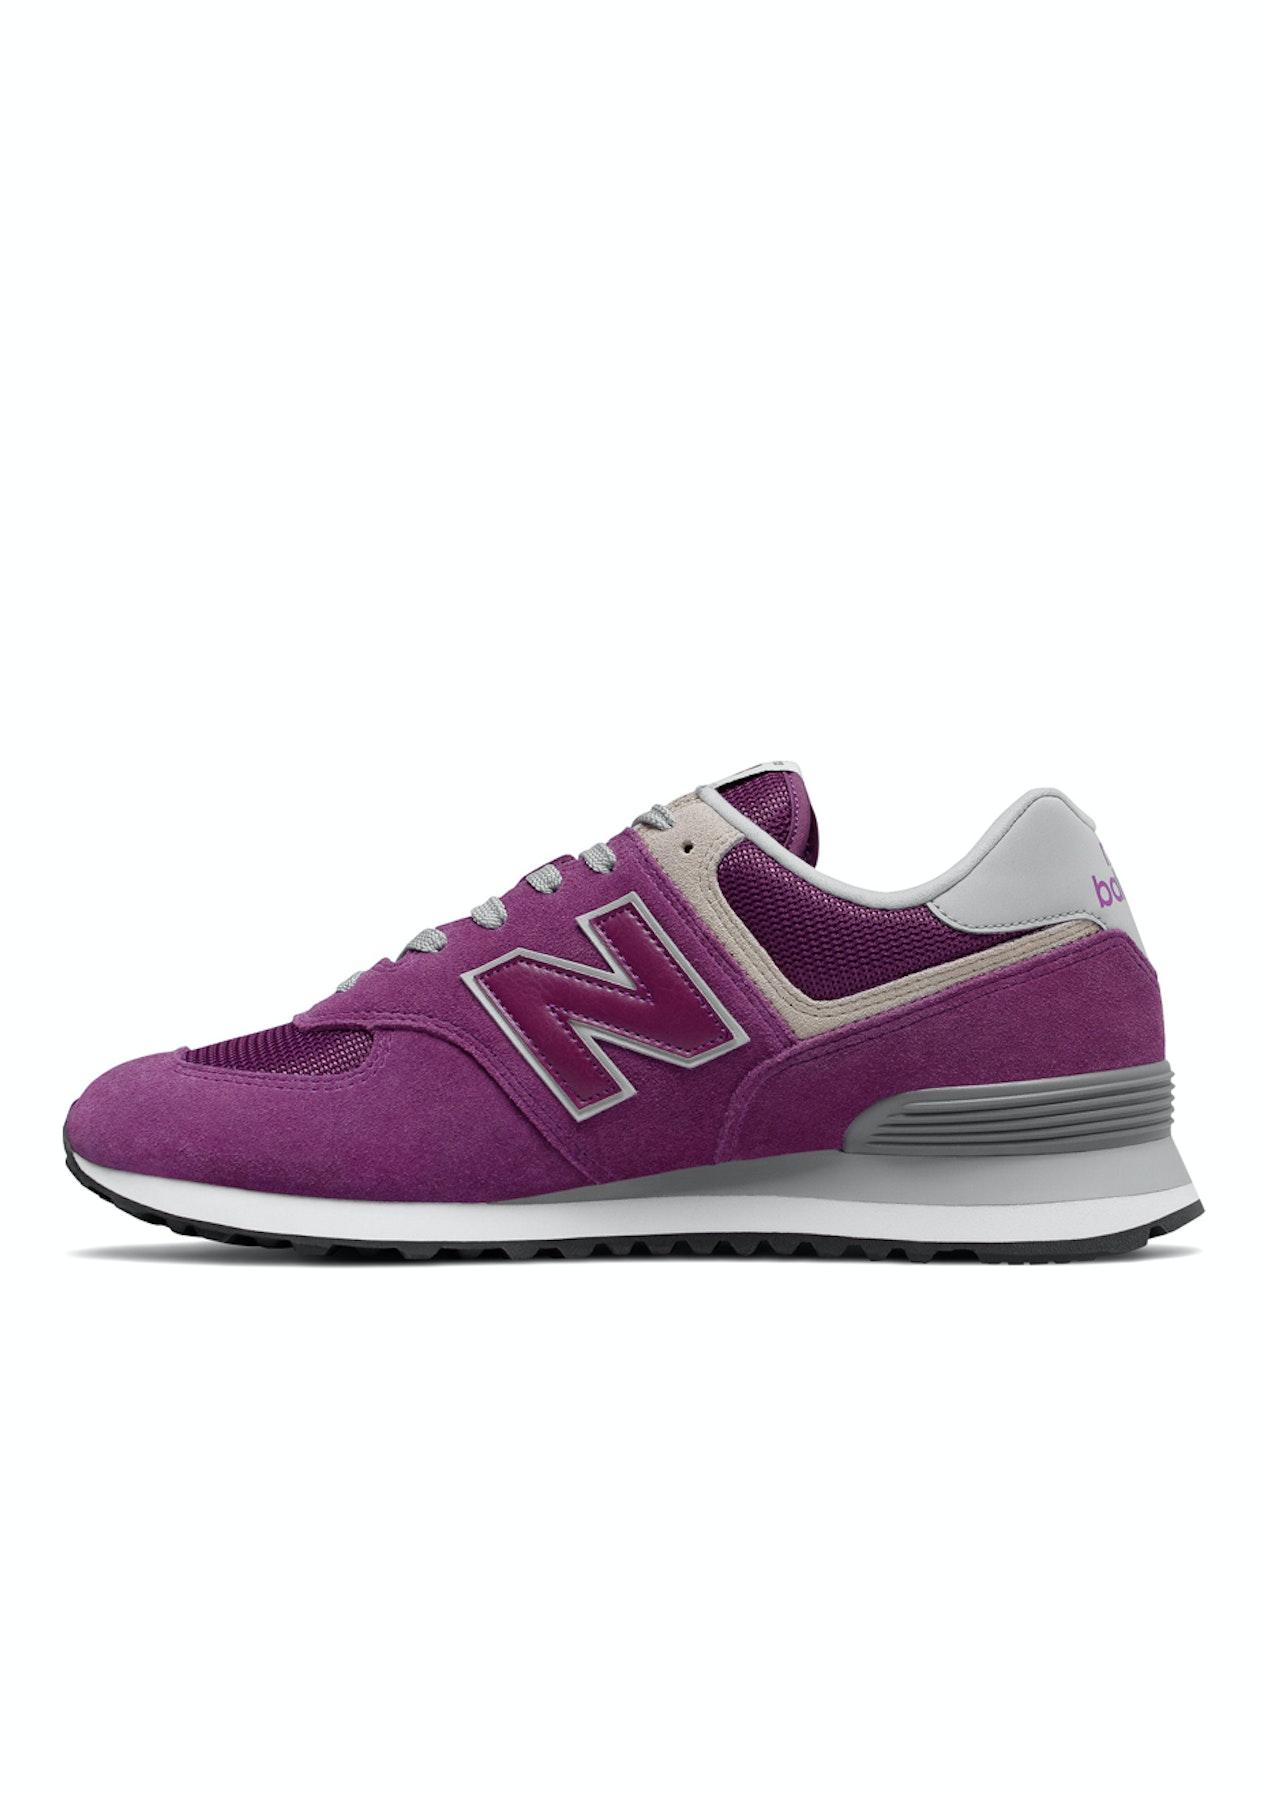 d02169cd66ffb New Balance - Mens 574 - Purple   White - Puma   New Balance Flash Sale -  Onceit